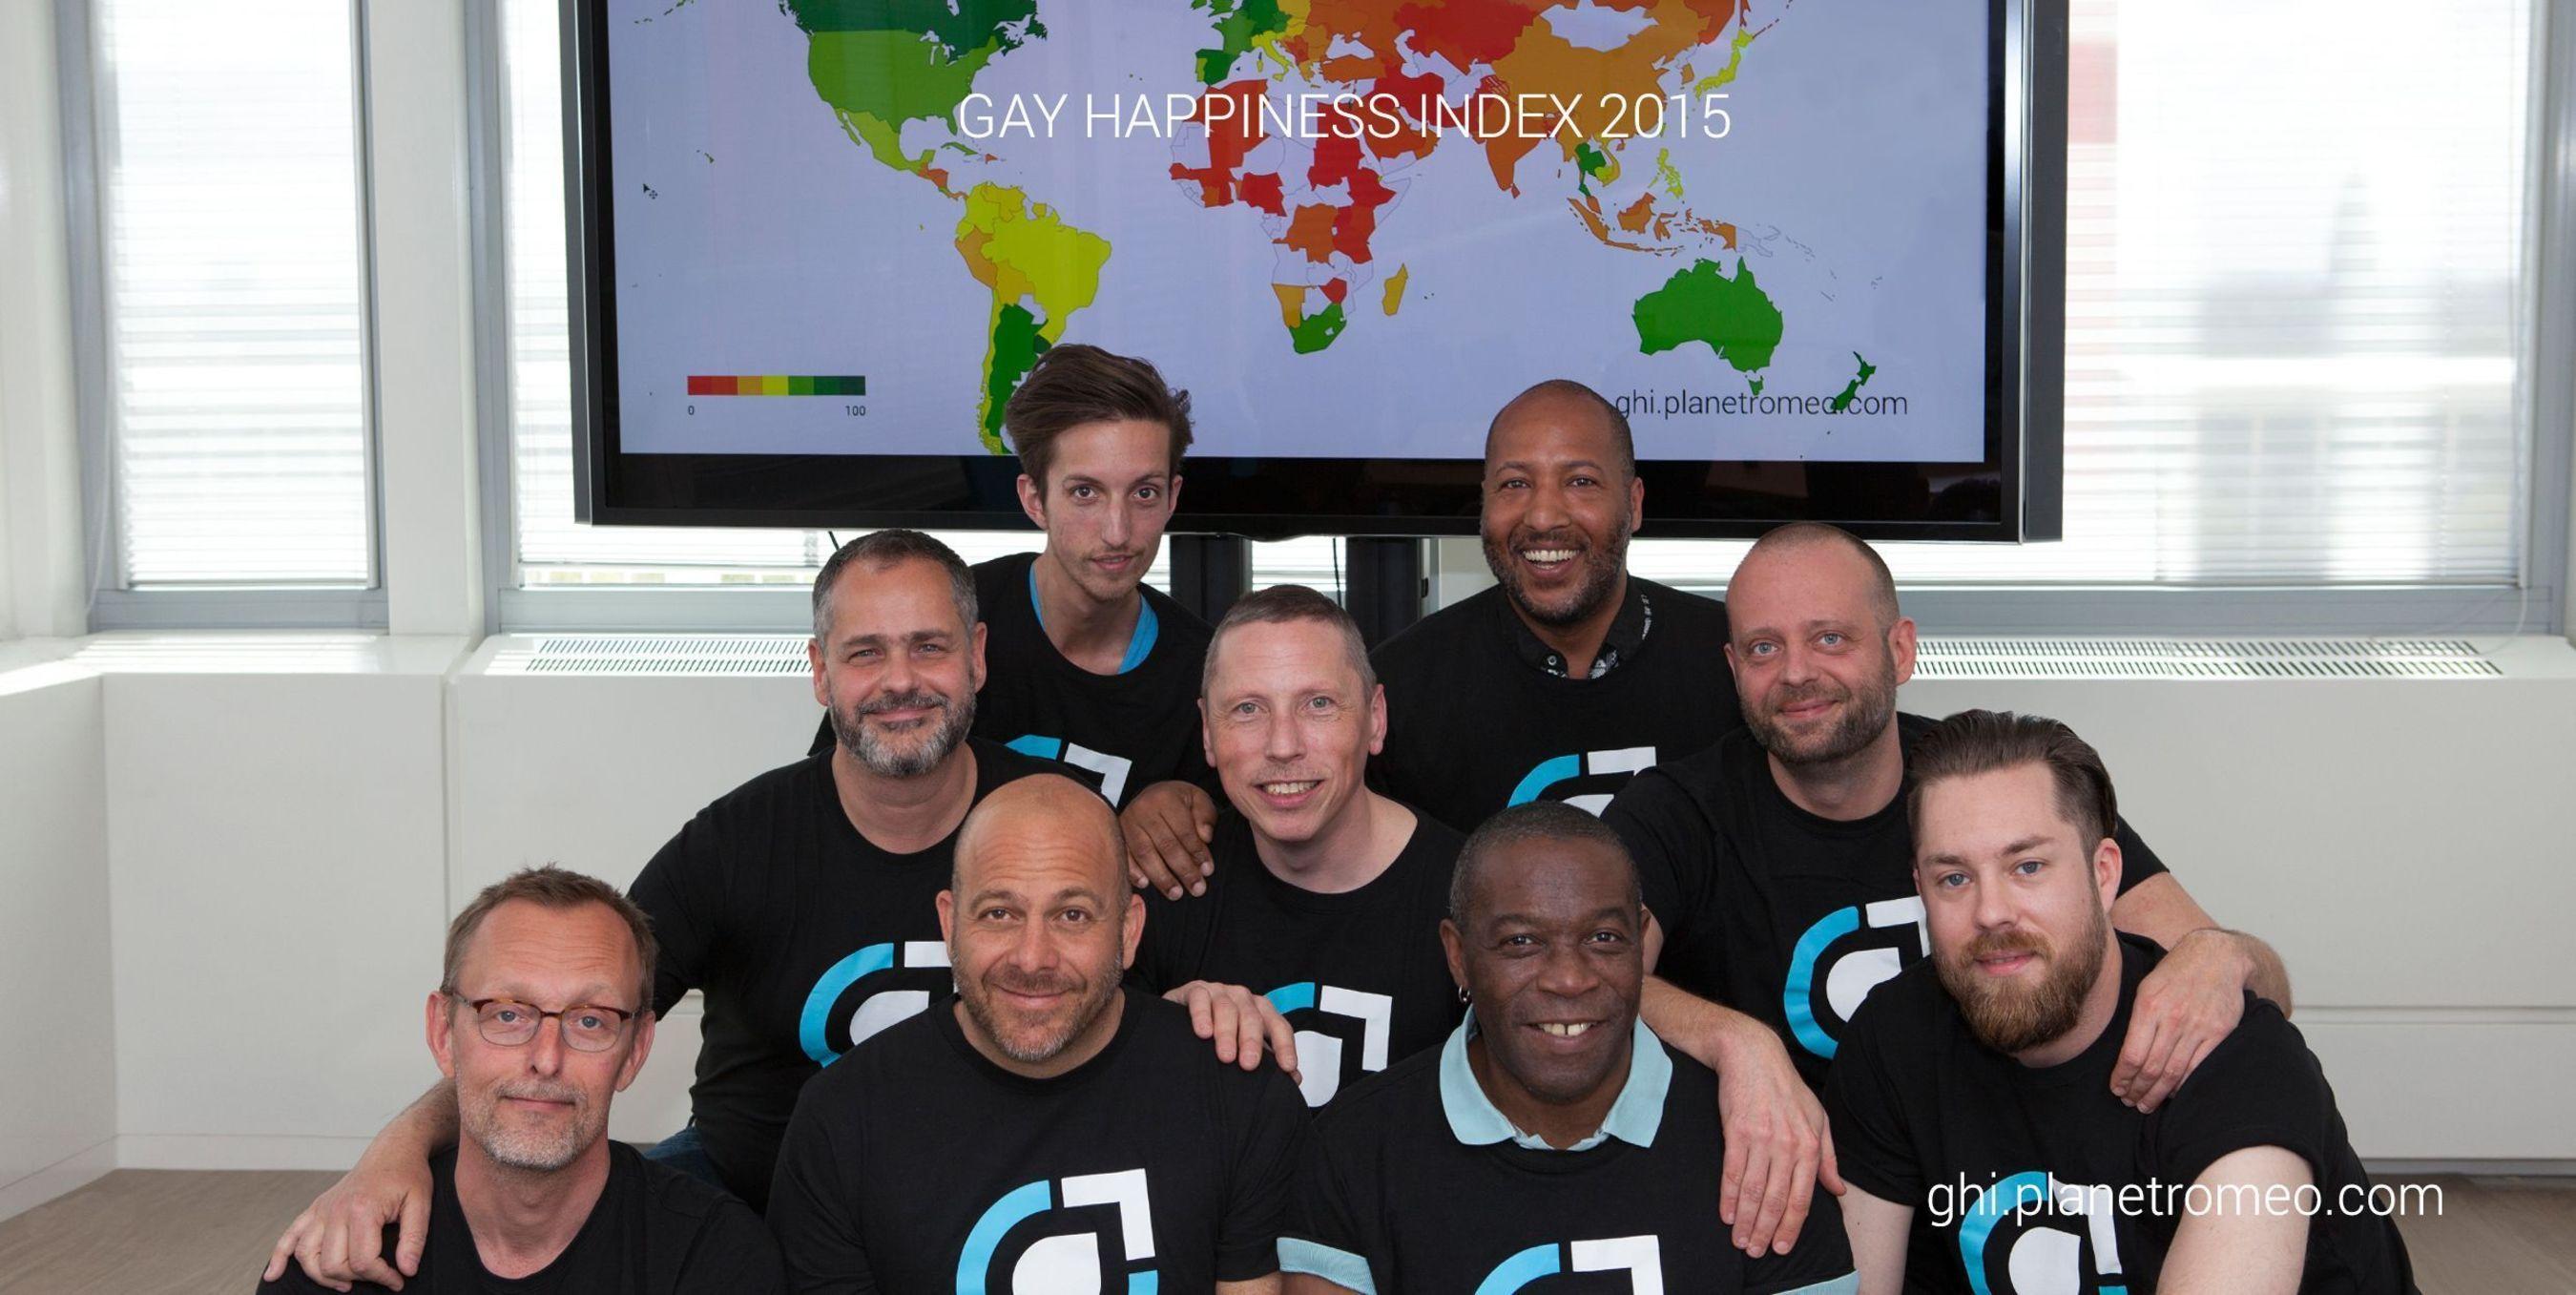 Gay Happiness Index 2015 Team members (PRNewsFoto/PlanetRomeo)